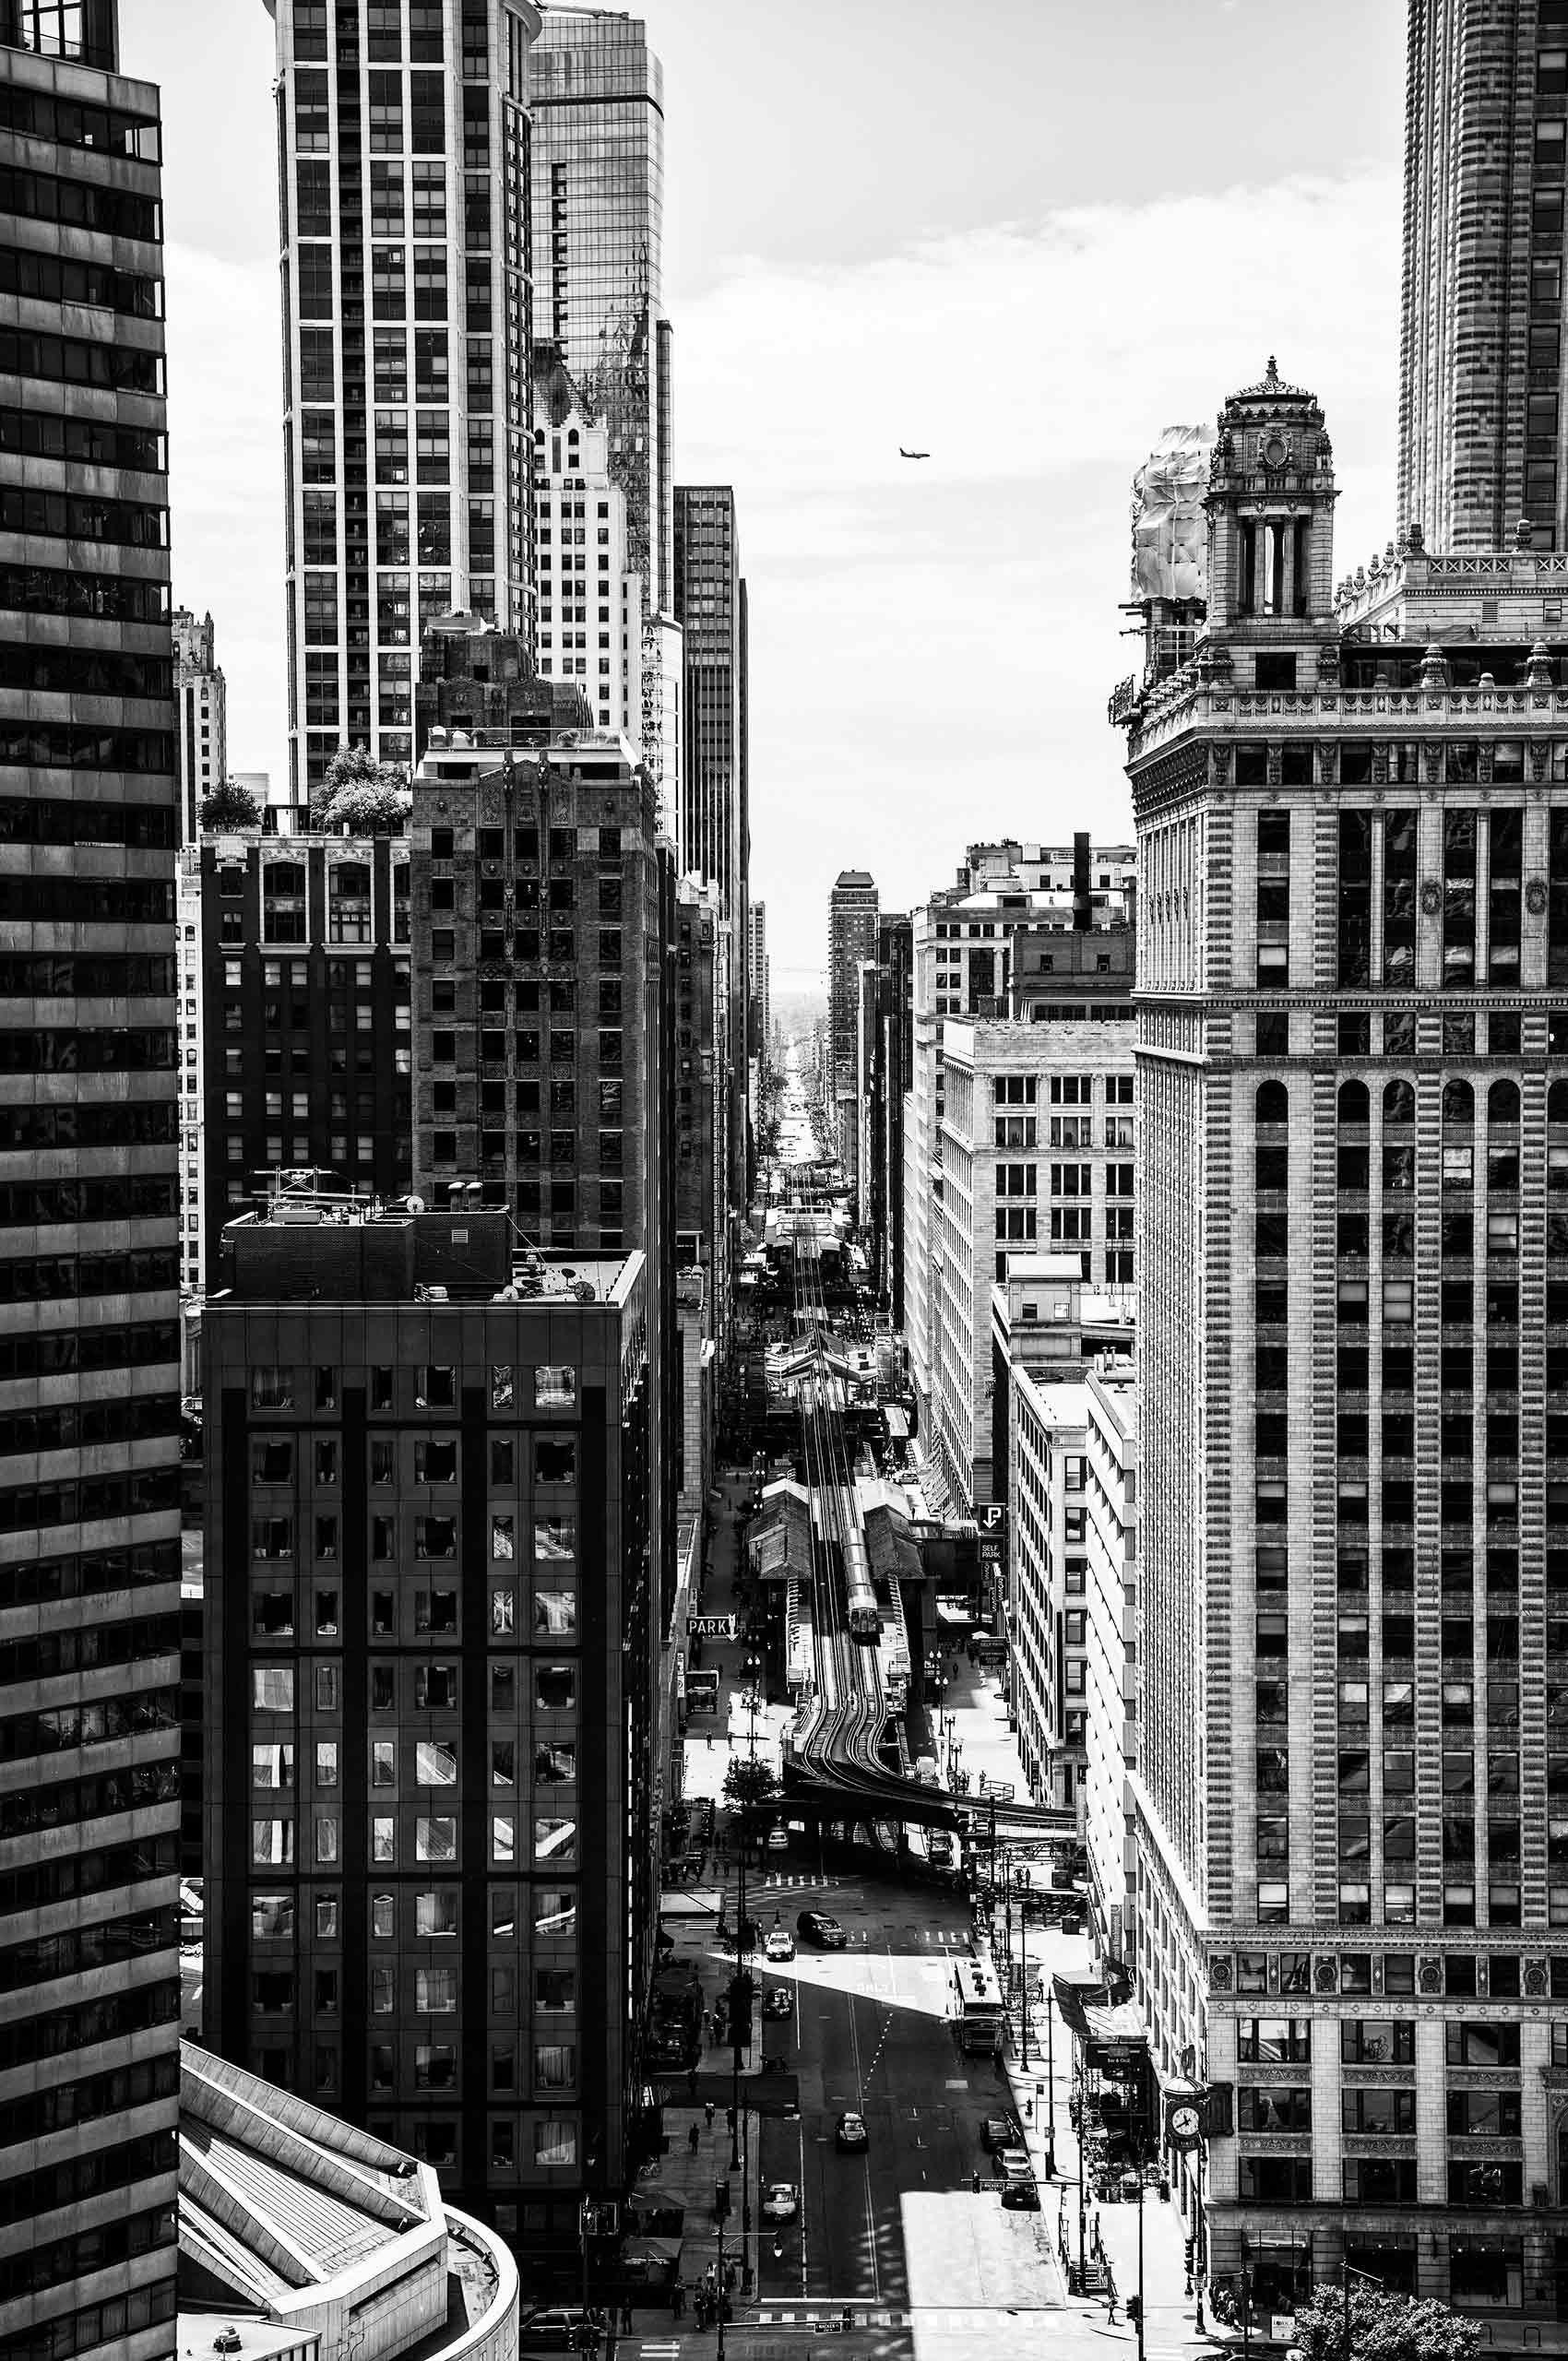 Metropolis-Chicago-by-HenrikOlundPhotography.jpg